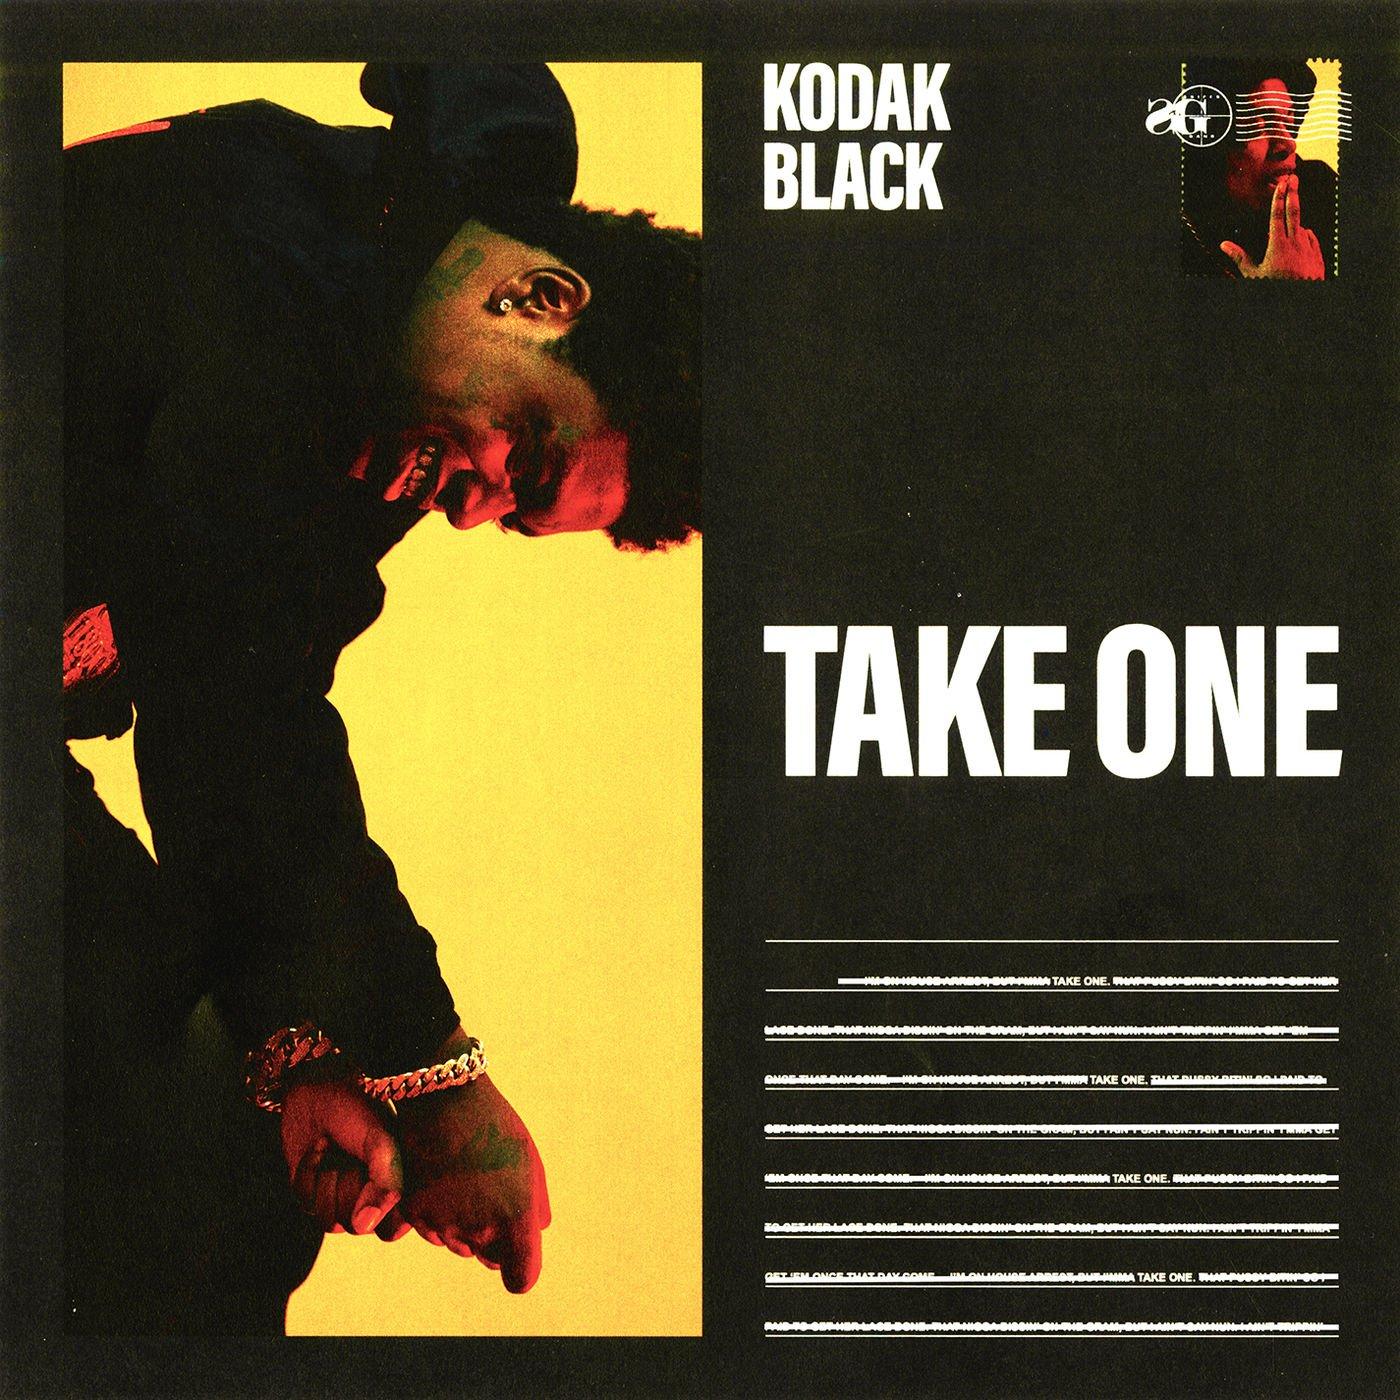 kodak black take one cover